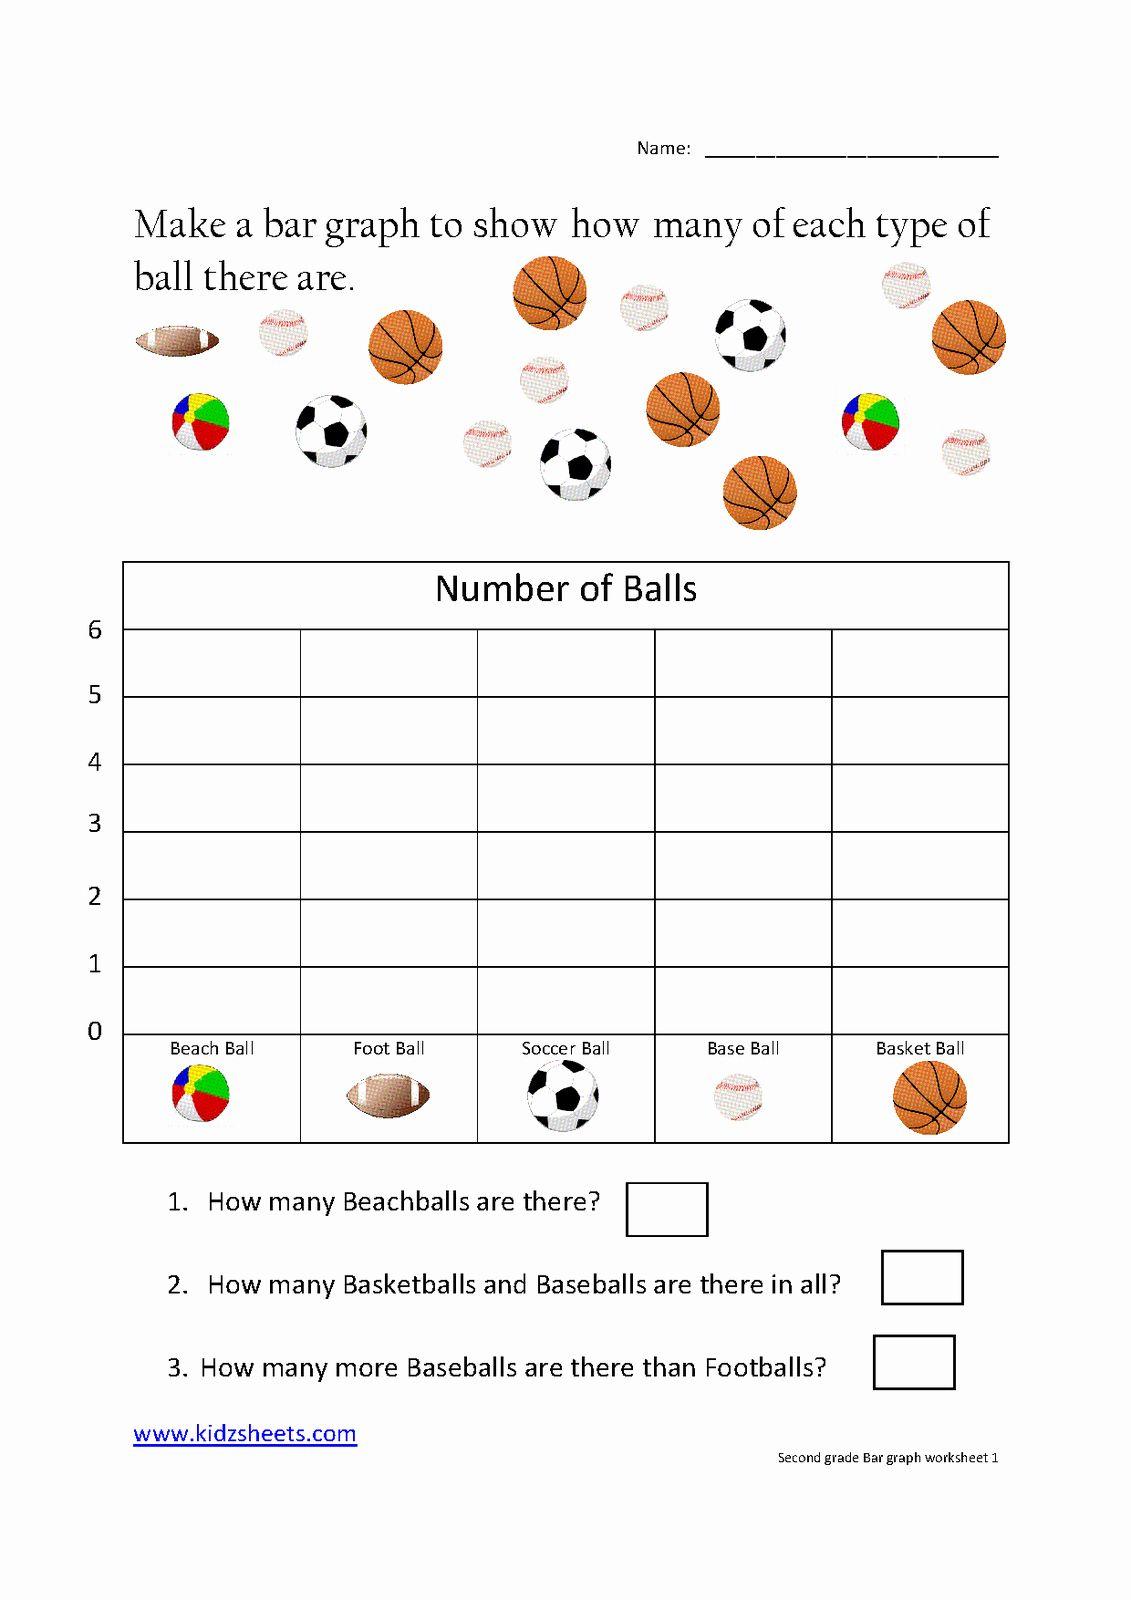 Free Bar Graph Worksheets Unique Kidz Worksheets Second Grade Bar Graph  Worksheet1   Graphing worksheets [ 1600 x 1131 Pixel ]